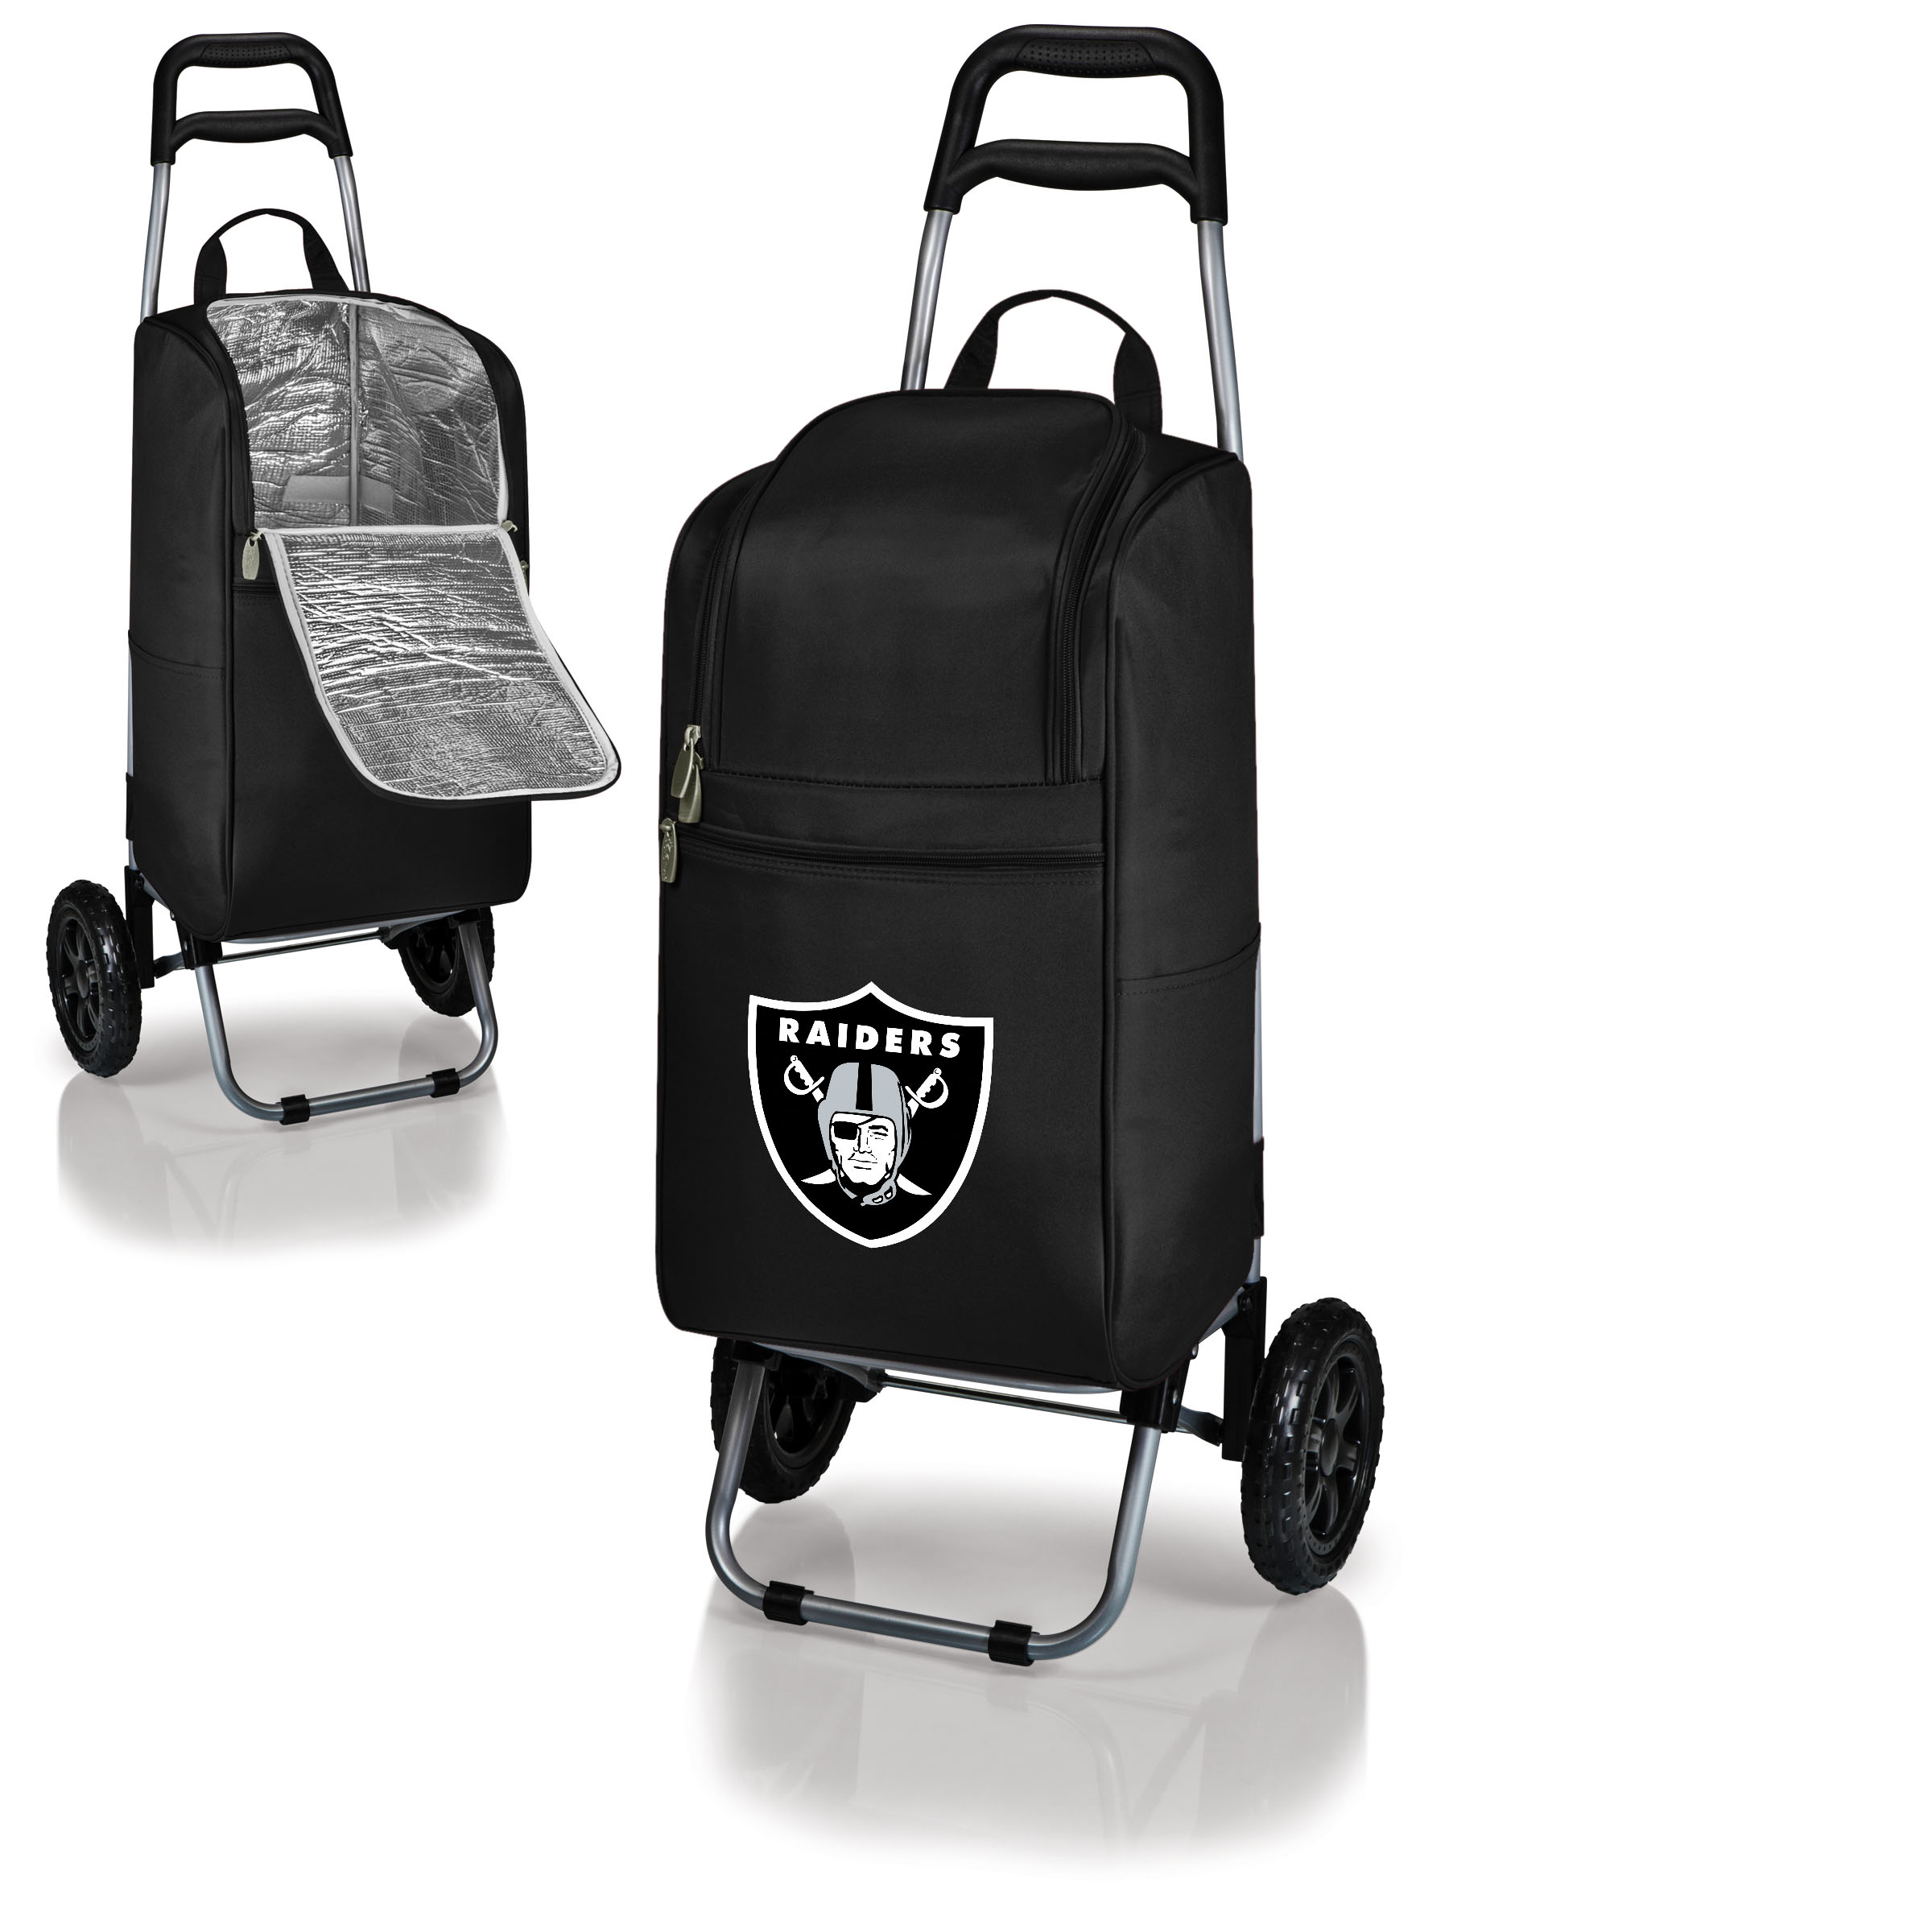 Oakland Raiders Cart Cooler - Black - No Size